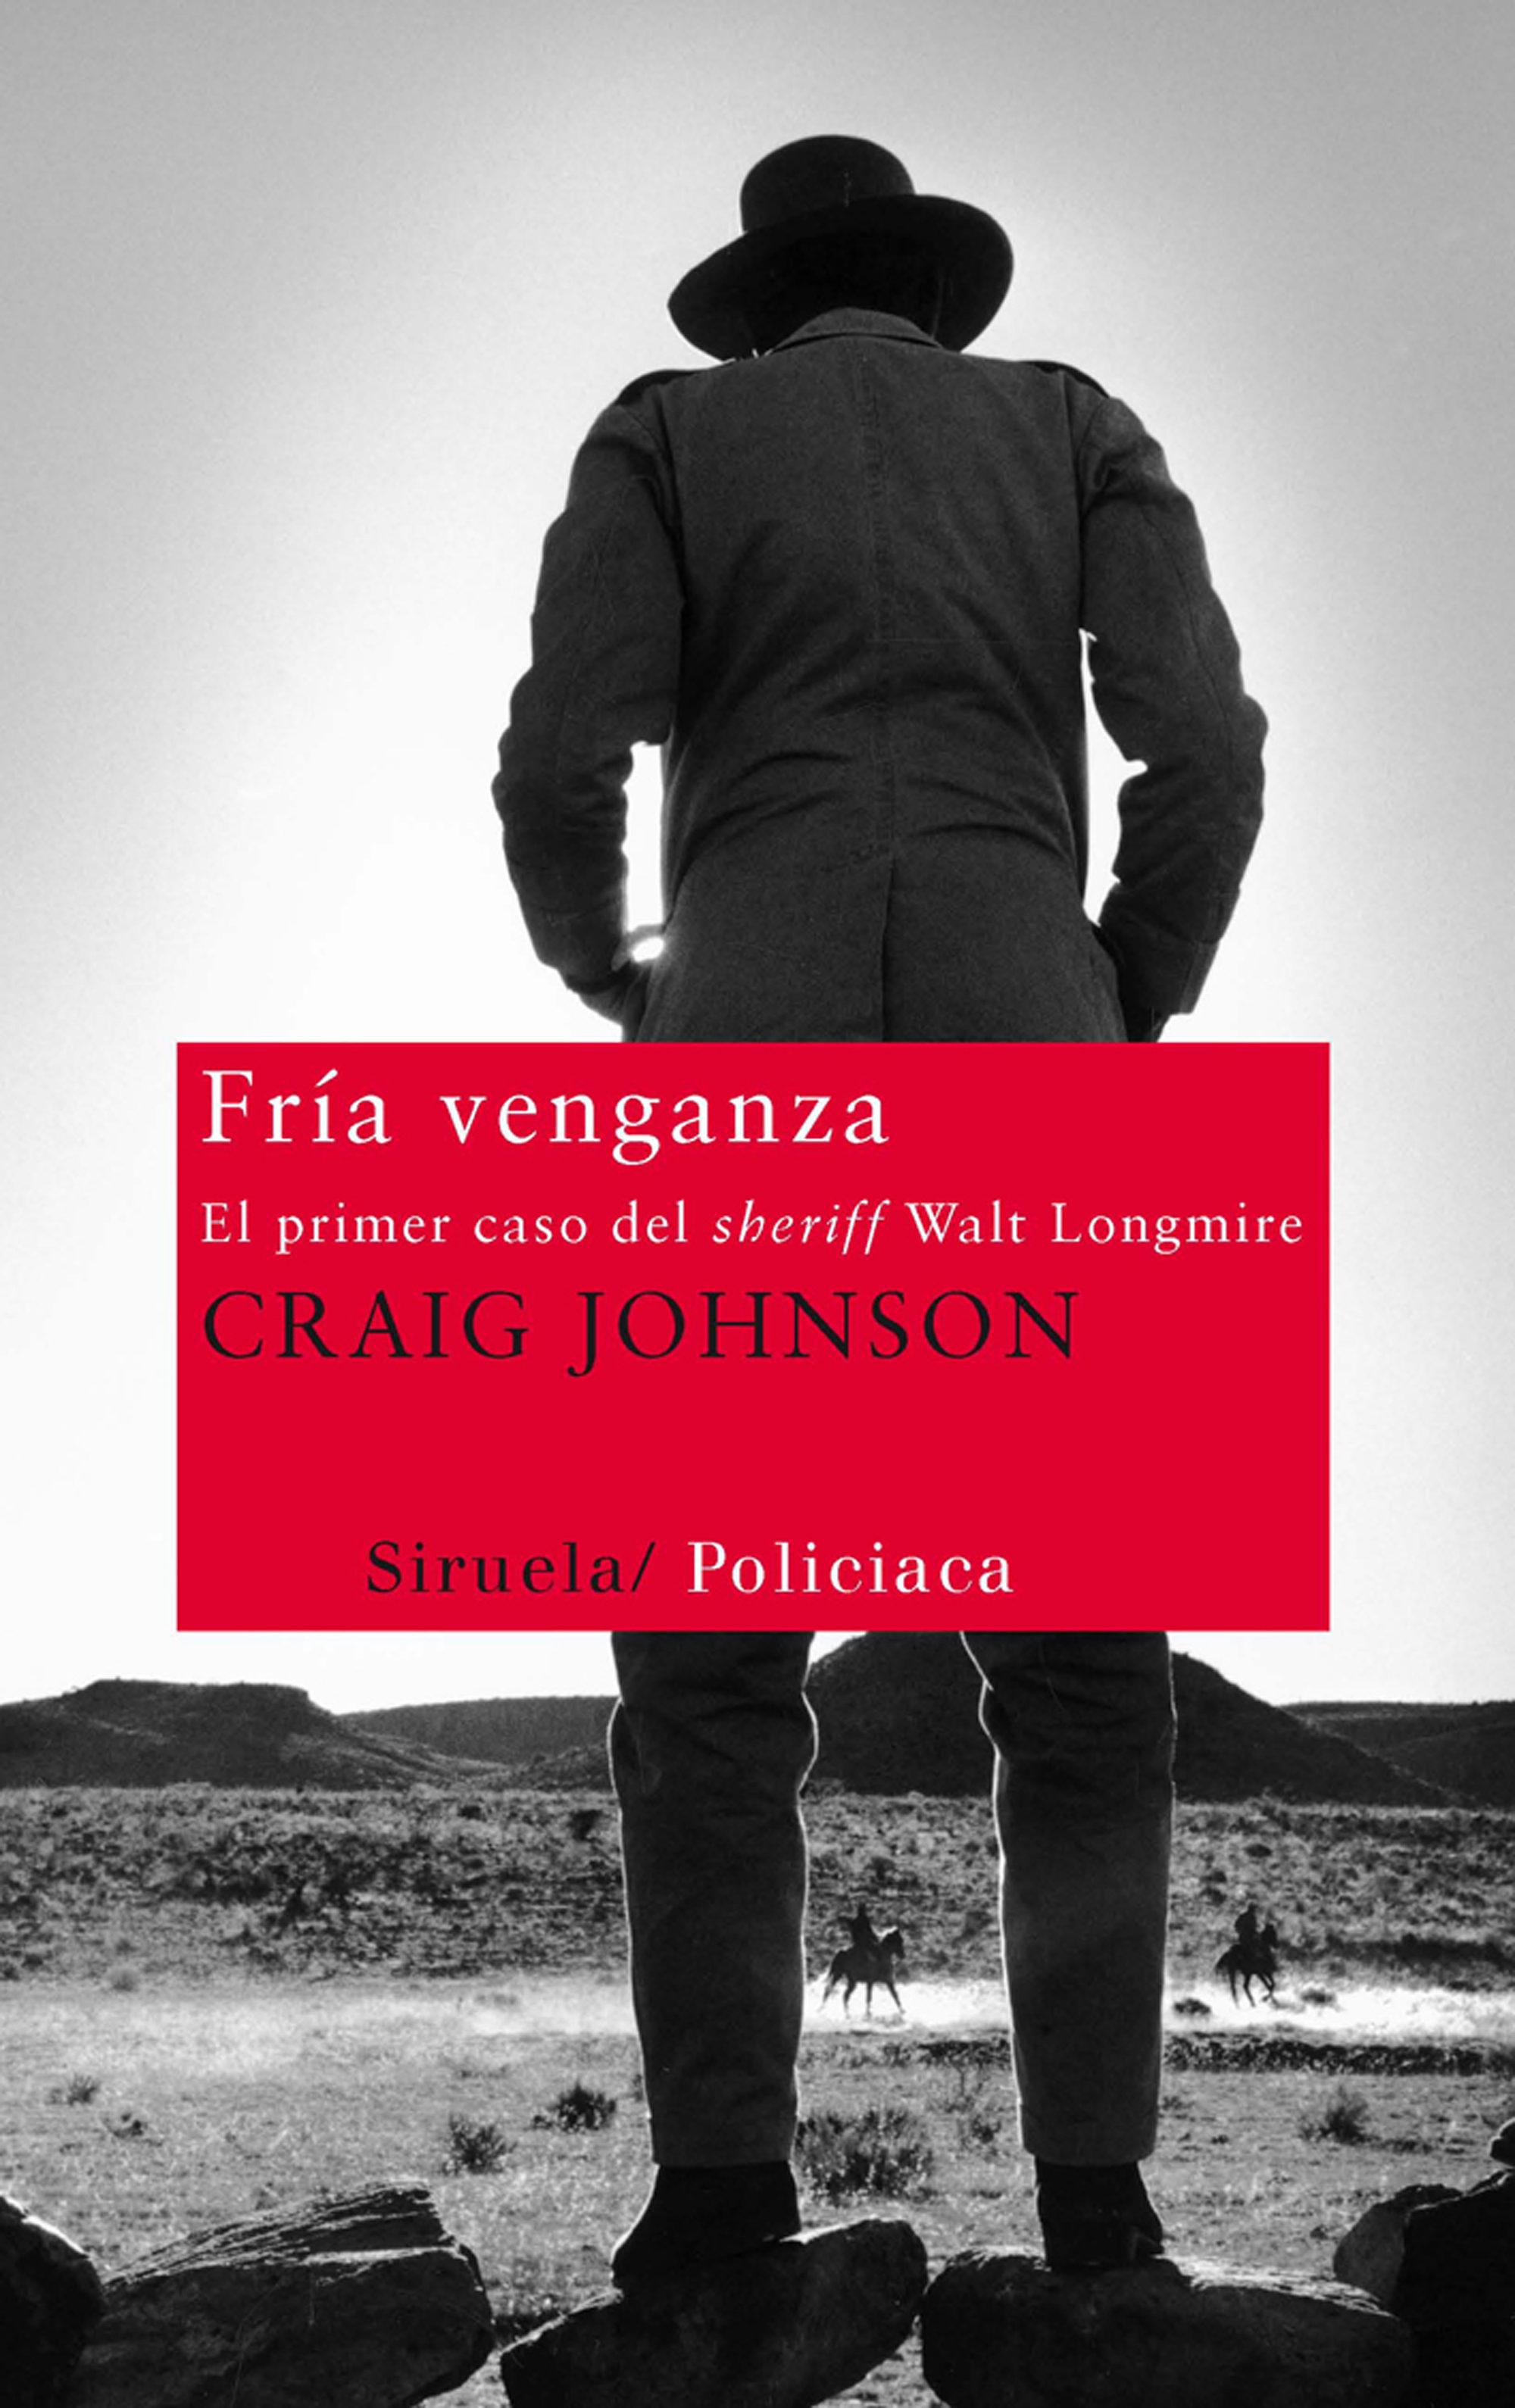 fria venganza: el primer caso del sheriff walt longmire-craig johnson-9788498415551